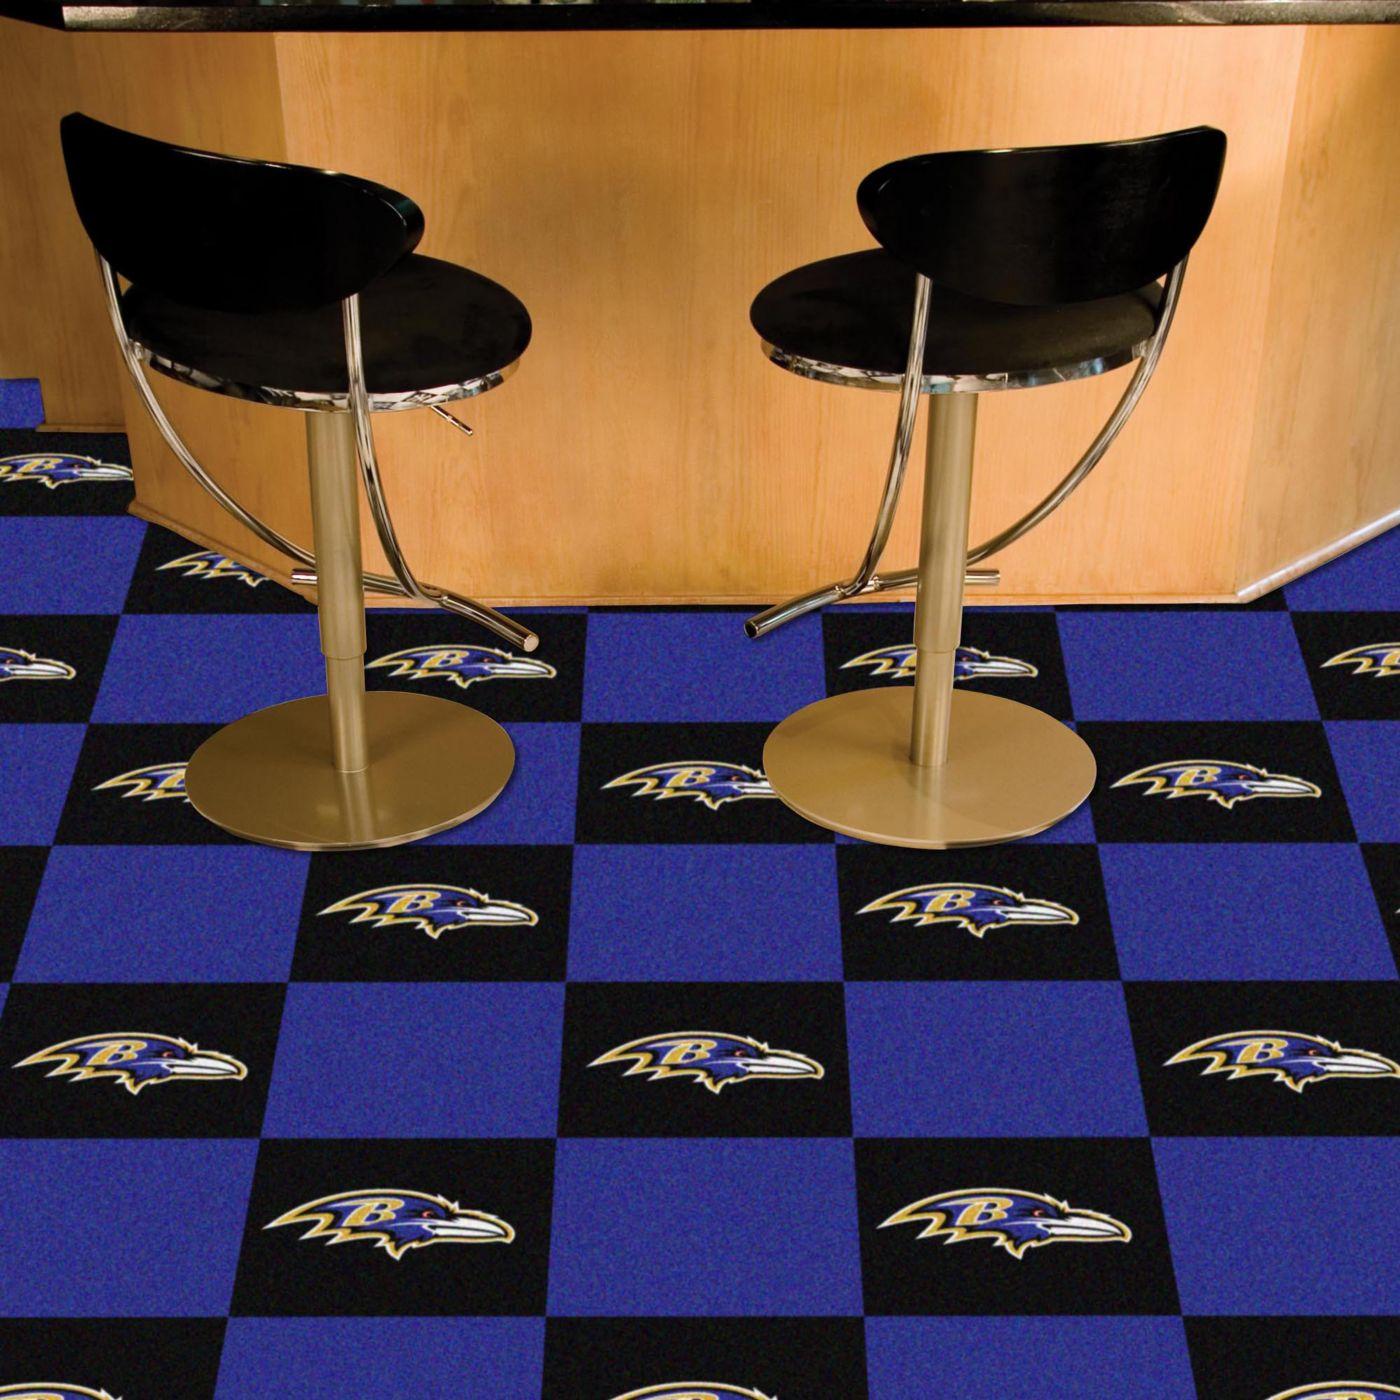 FANMATS Baltimore Ravens Team Carpet Tiles